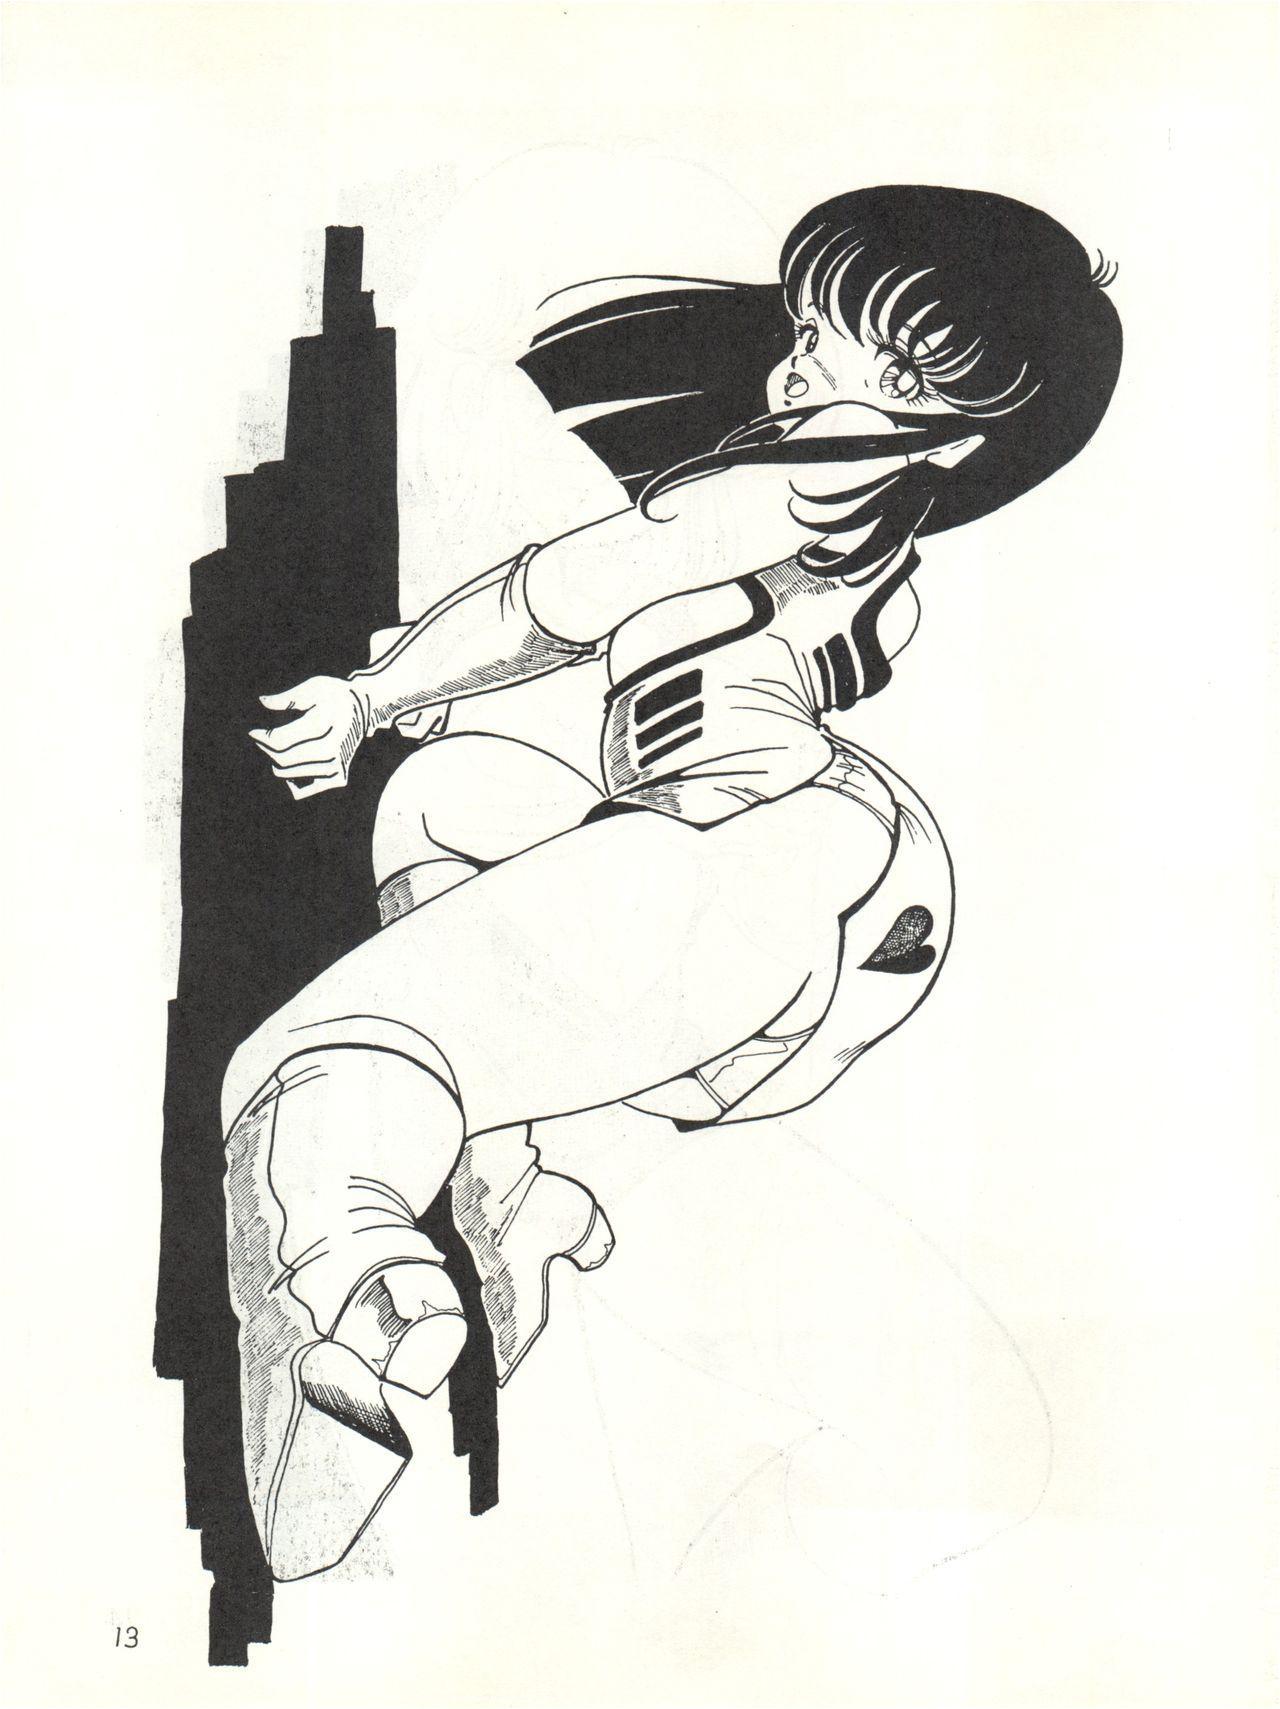 Soldier Lady vol. 8 14